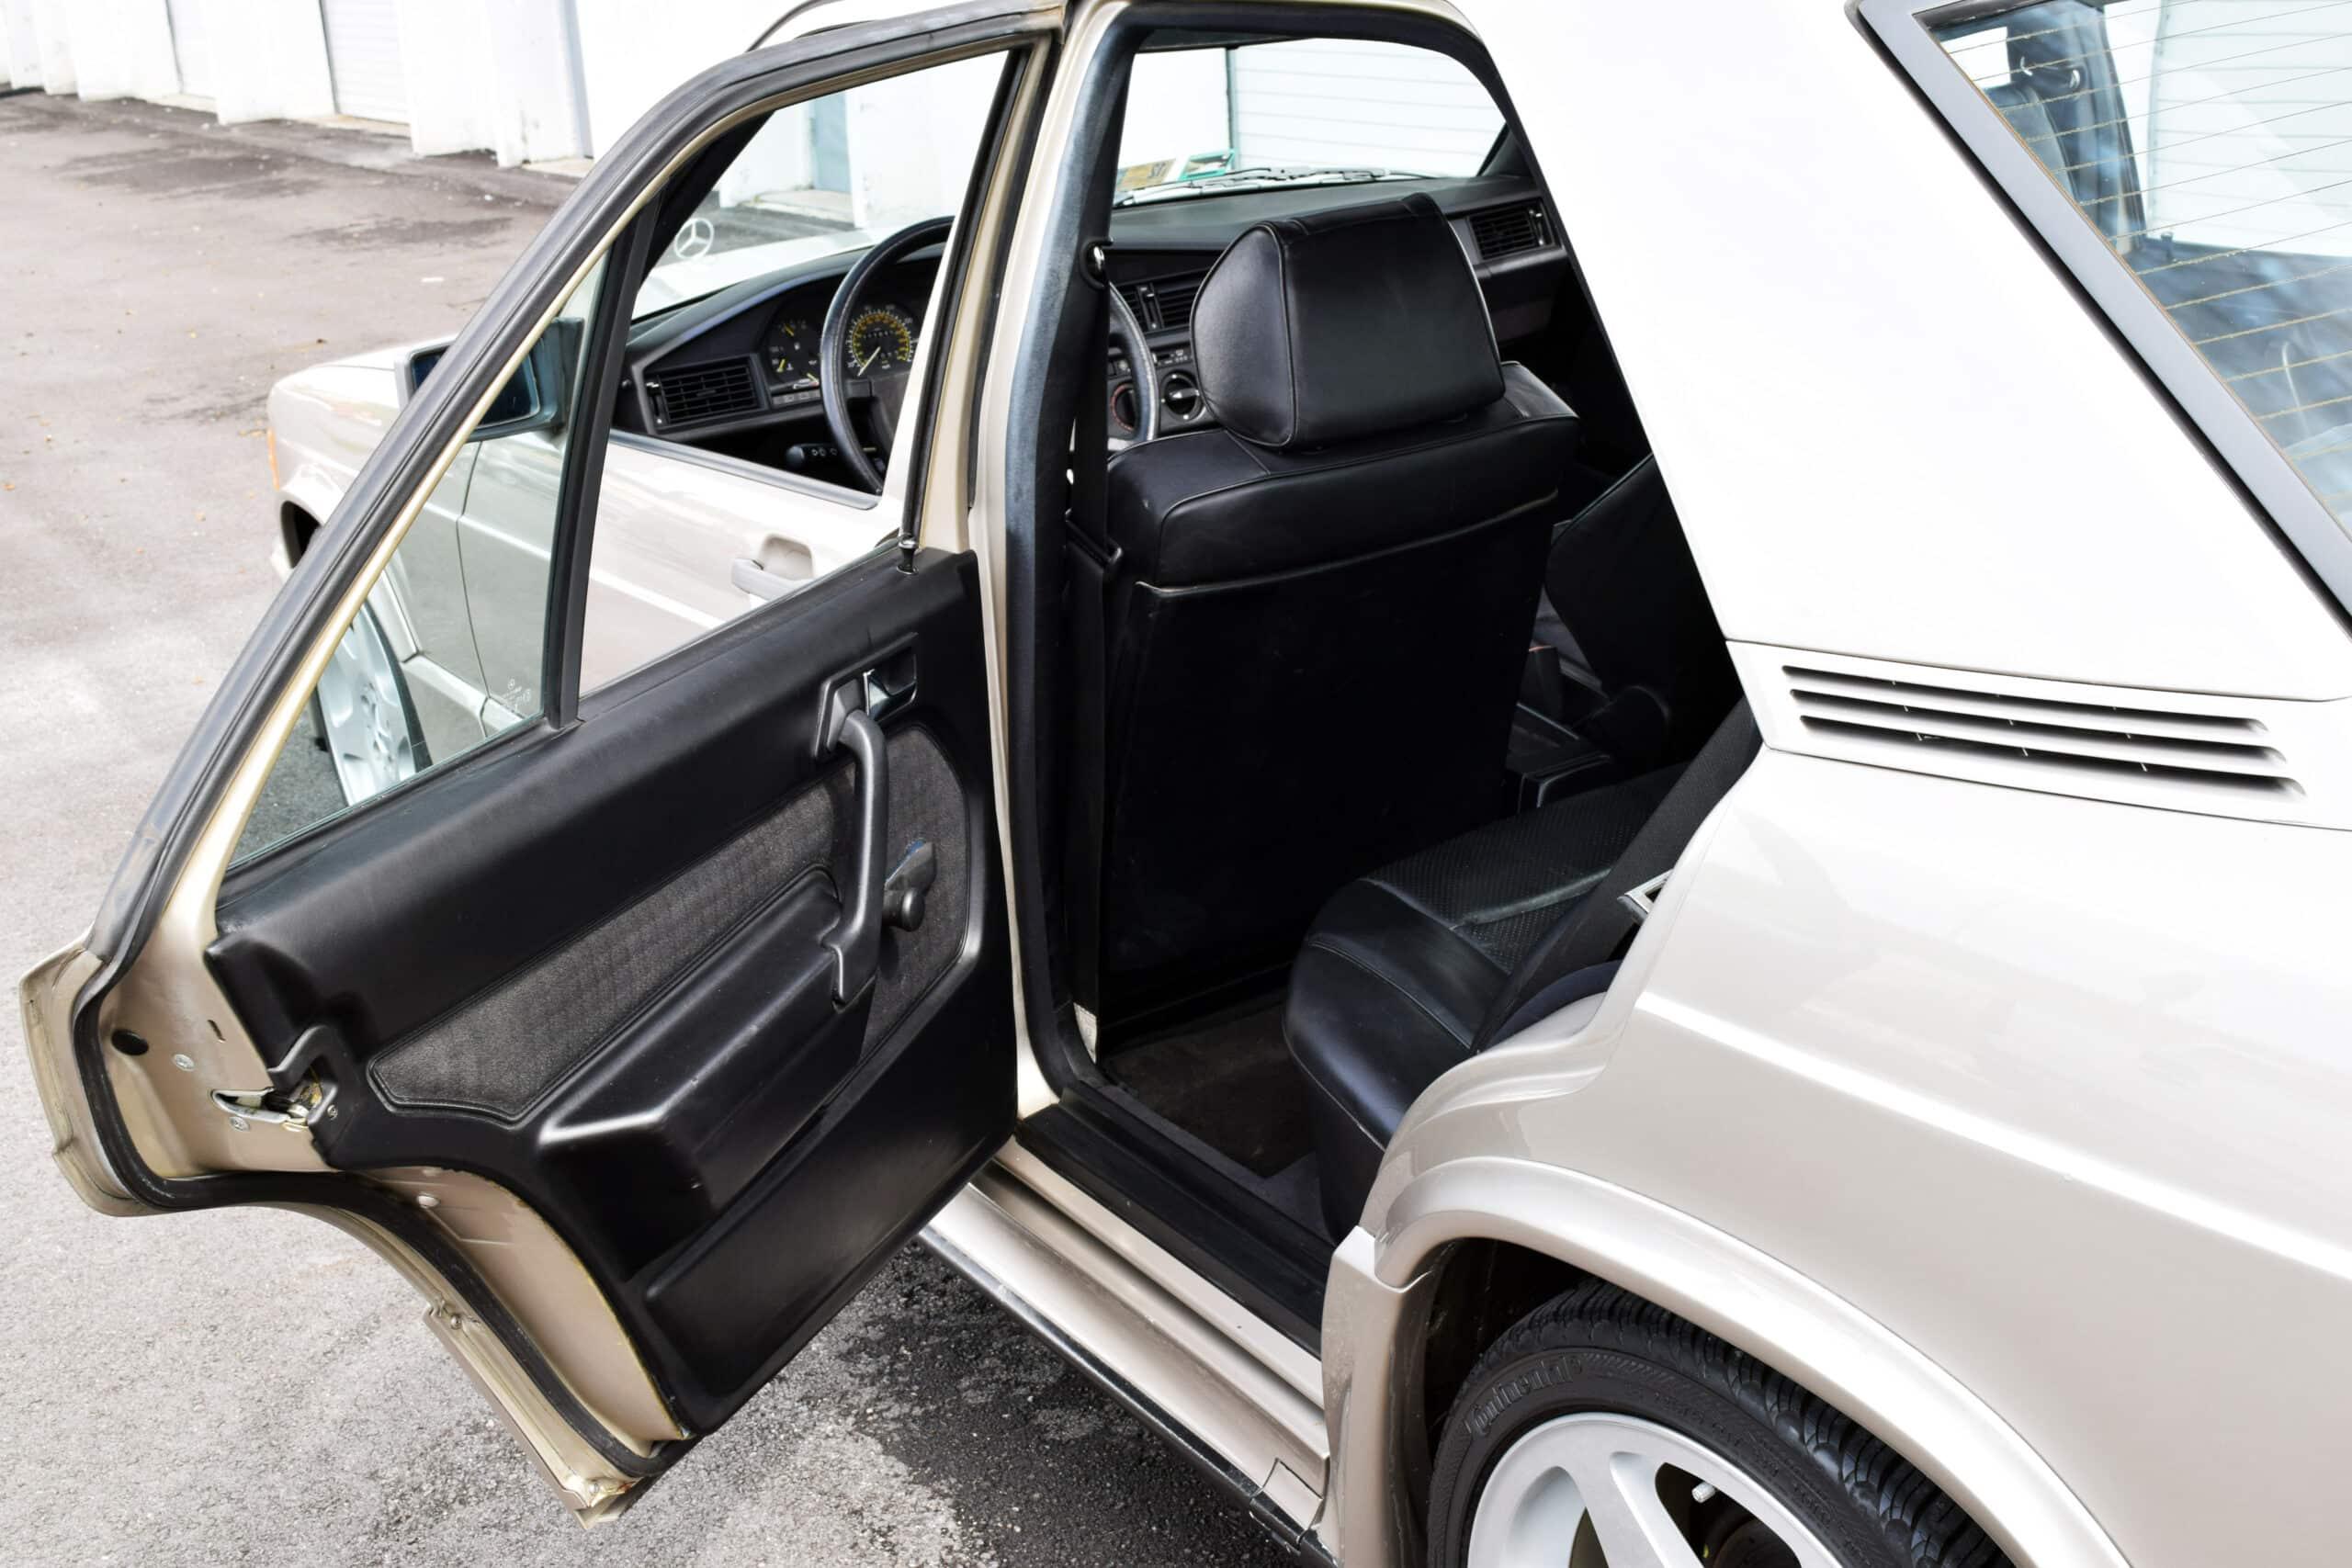 1985 Mercedes-Benz 190E Cosworth 2.3-16, EVO II WHEELS, 5-SPEED DOGLEG